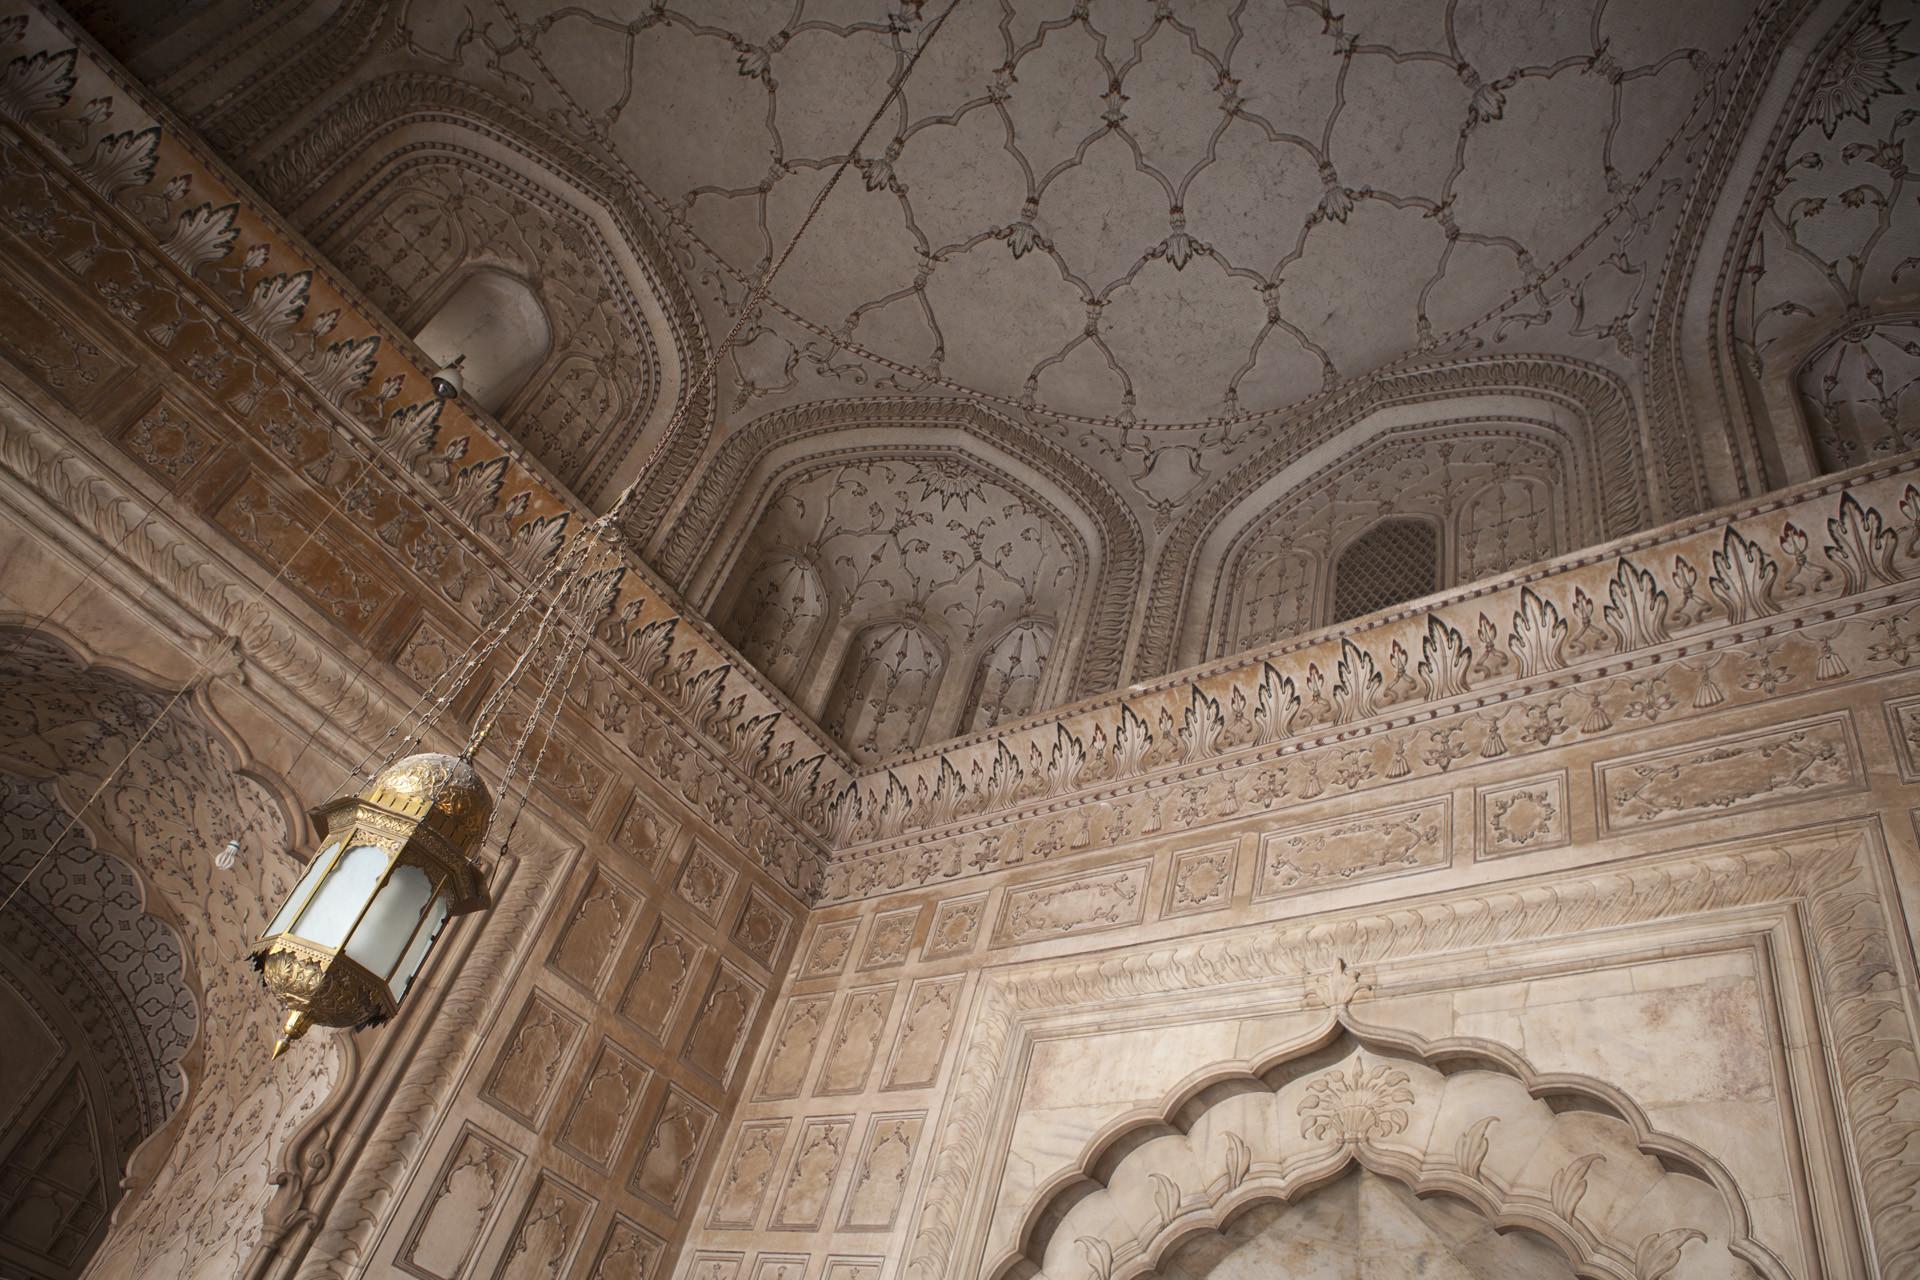 Badshahi Mosque Ceiling